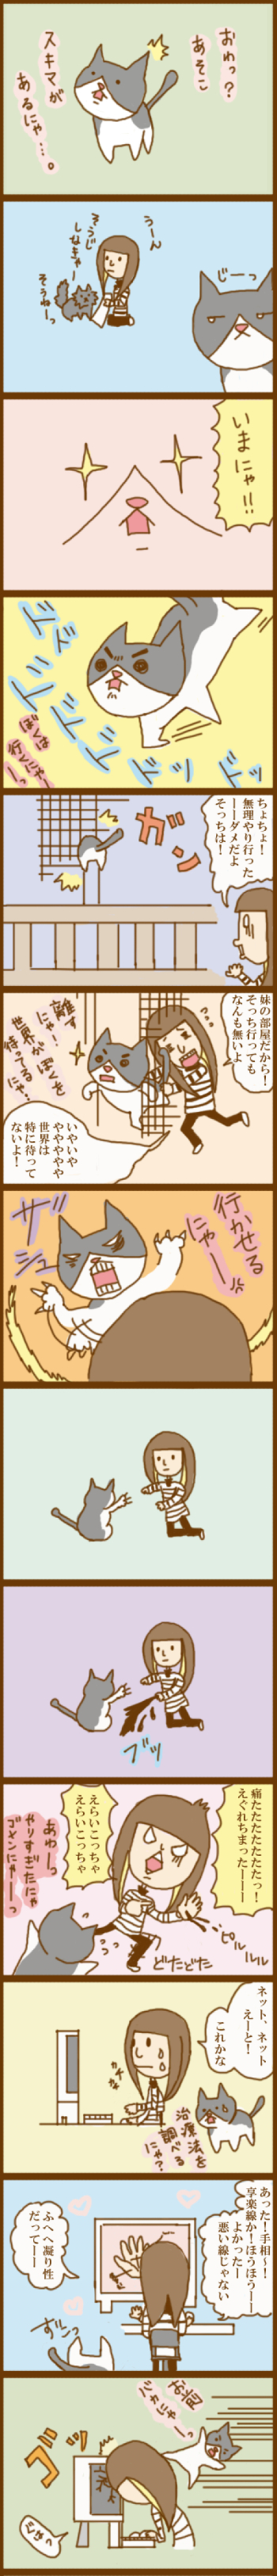 f:id:suzuokayu:20201017212614j:plain